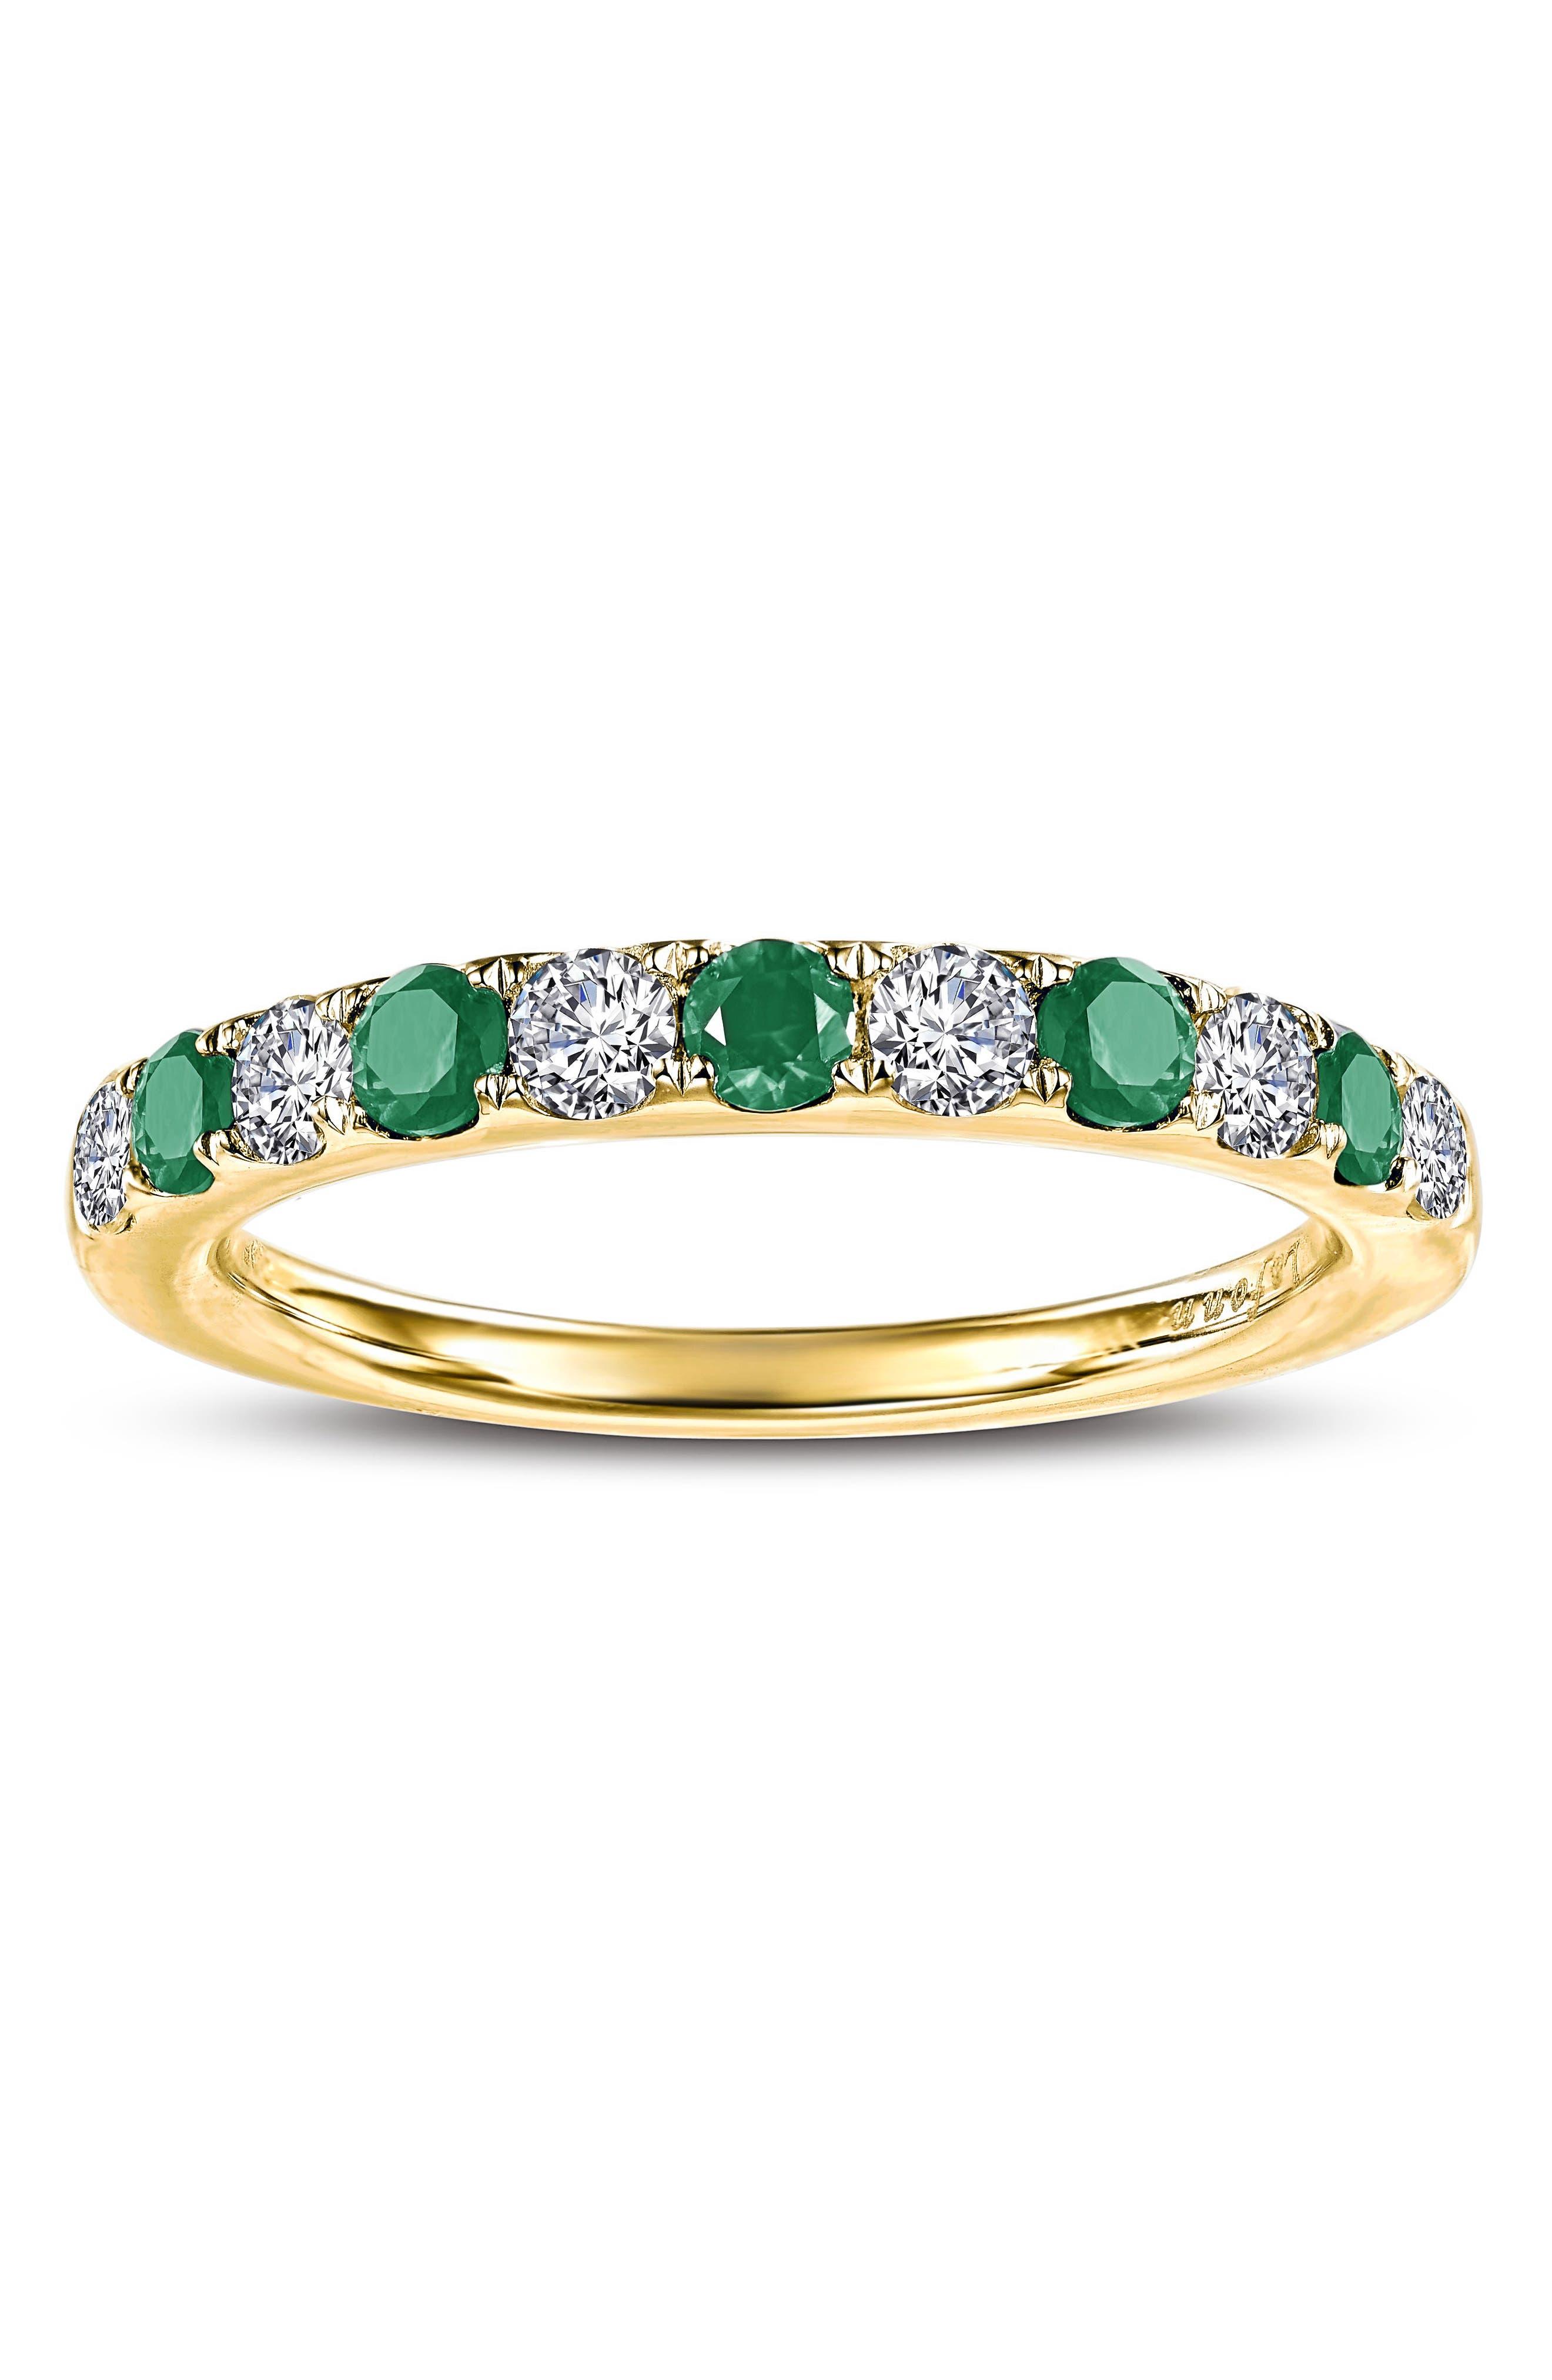 Simulated Diamond Birthstone Band Ring,                             Alternate thumbnail 2, color,                             MAY - GREEN/ GOLD